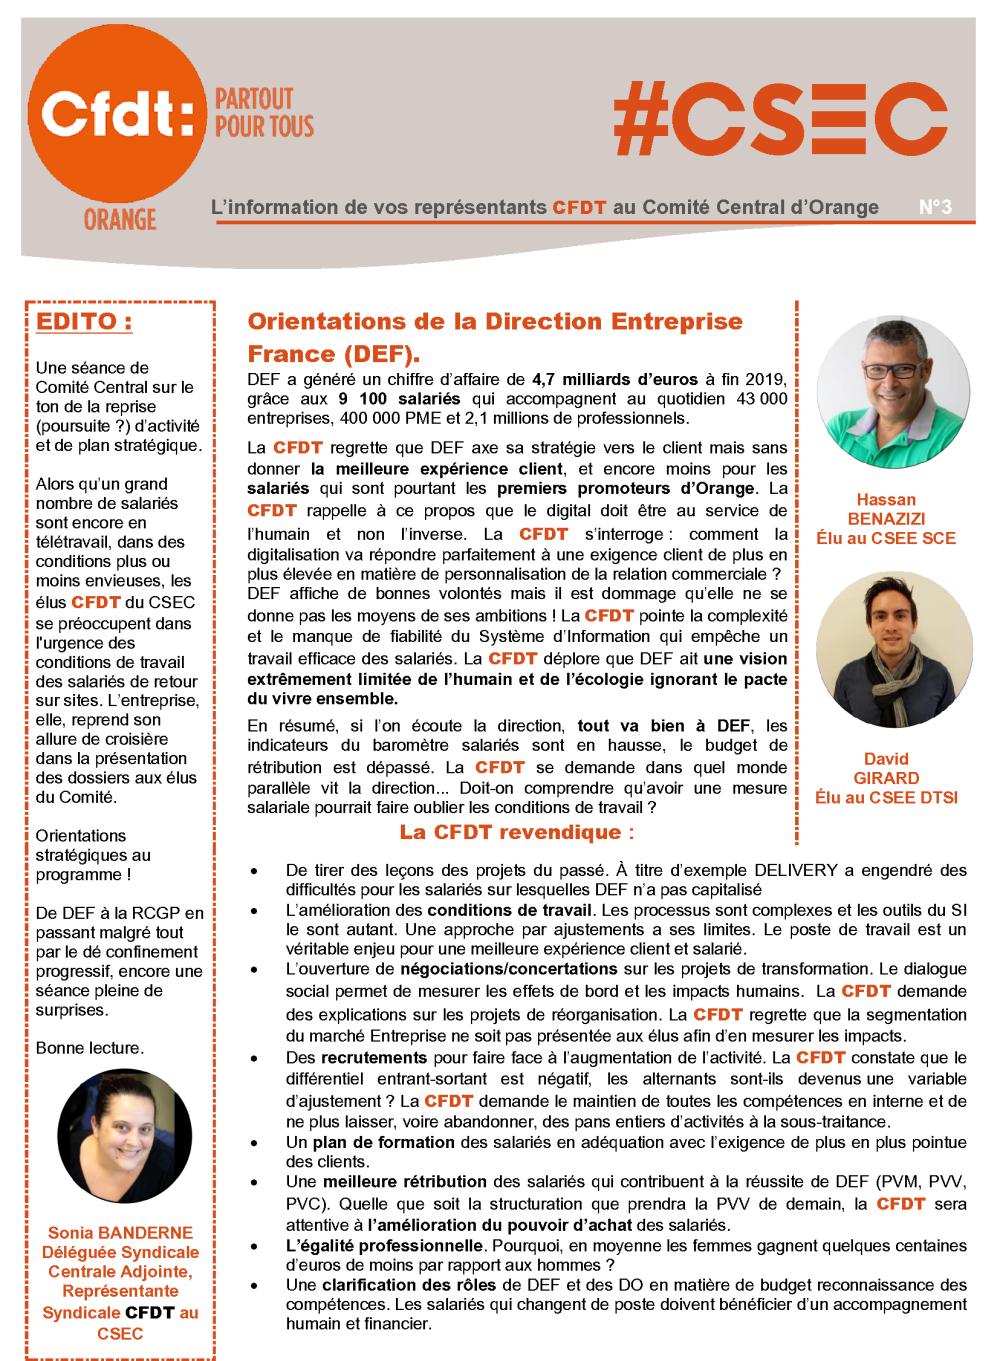 http://www.emailing.sce.cfdt-ftorange.fr/images /ScePublicCom/Tract_Liaison_Orange/20TT0702_TP_Orange_-_CSEC_n3.pdf